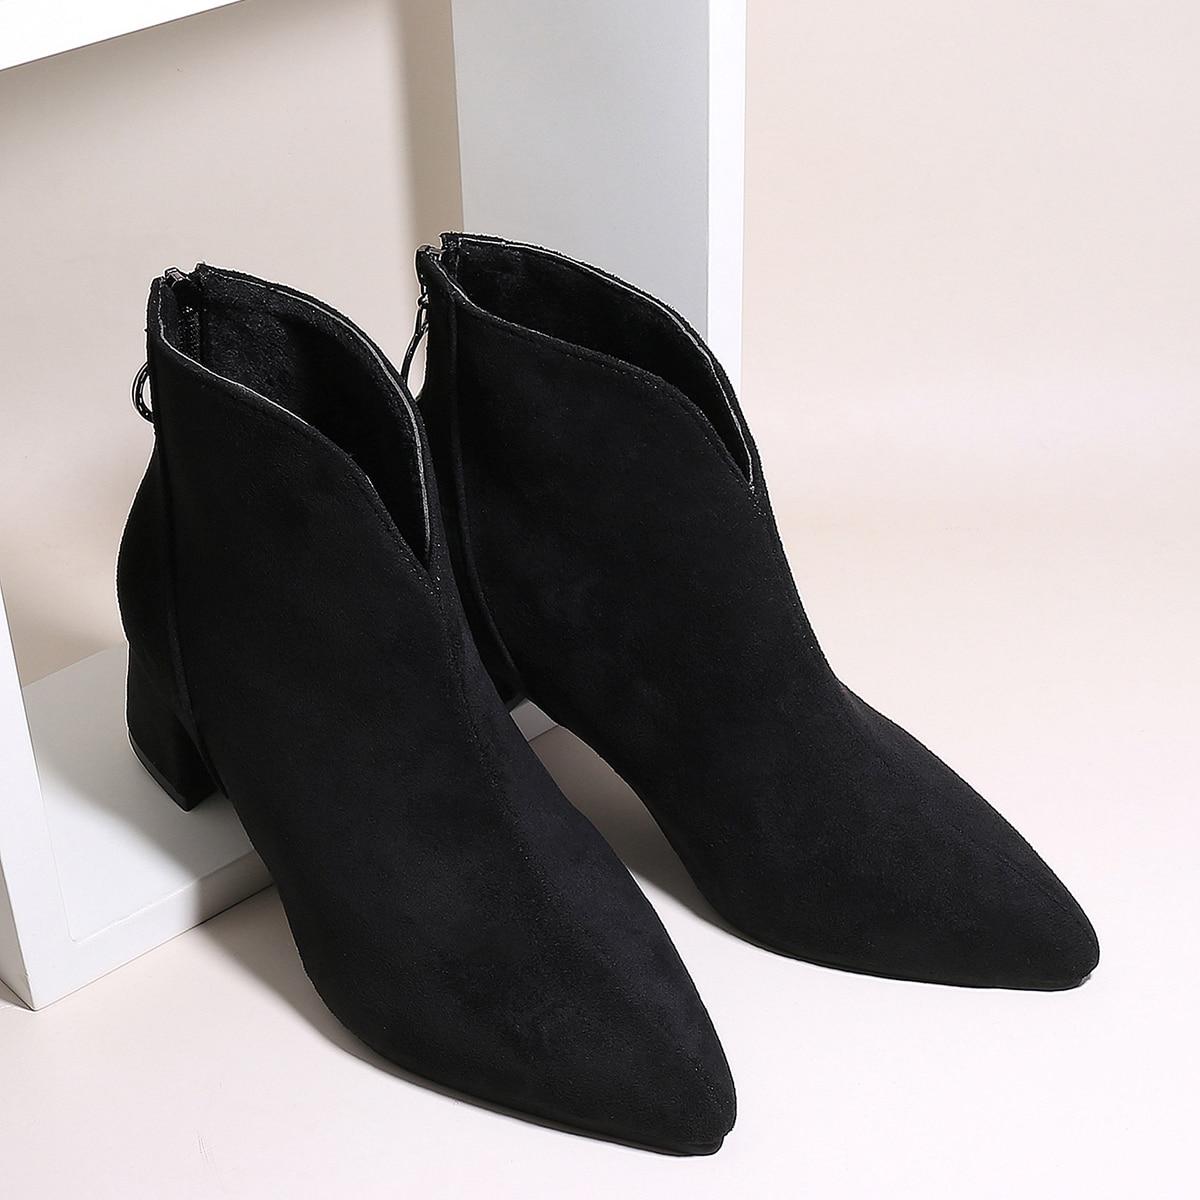 shein Stevige laarzen met puntige neus en rits